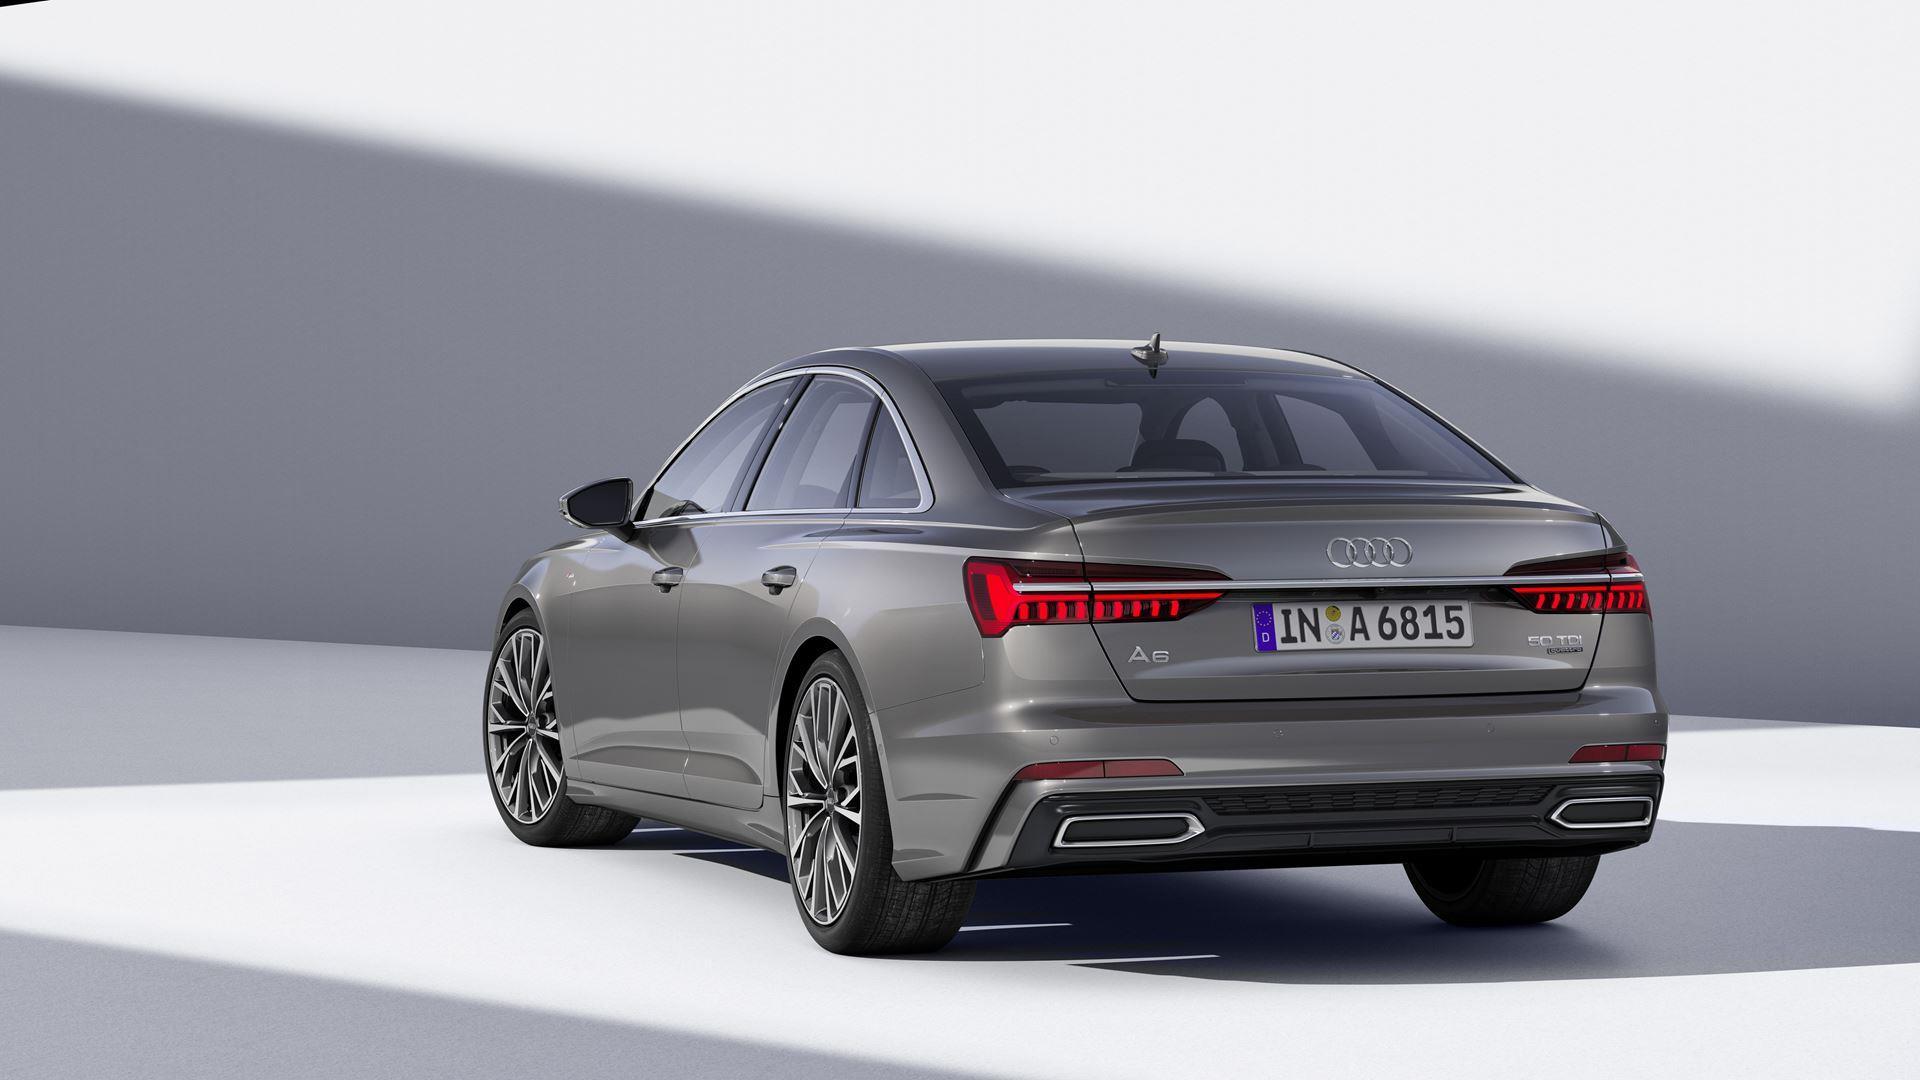 2019 Audi A6 Saloon Wallpapers Hd Drivespark